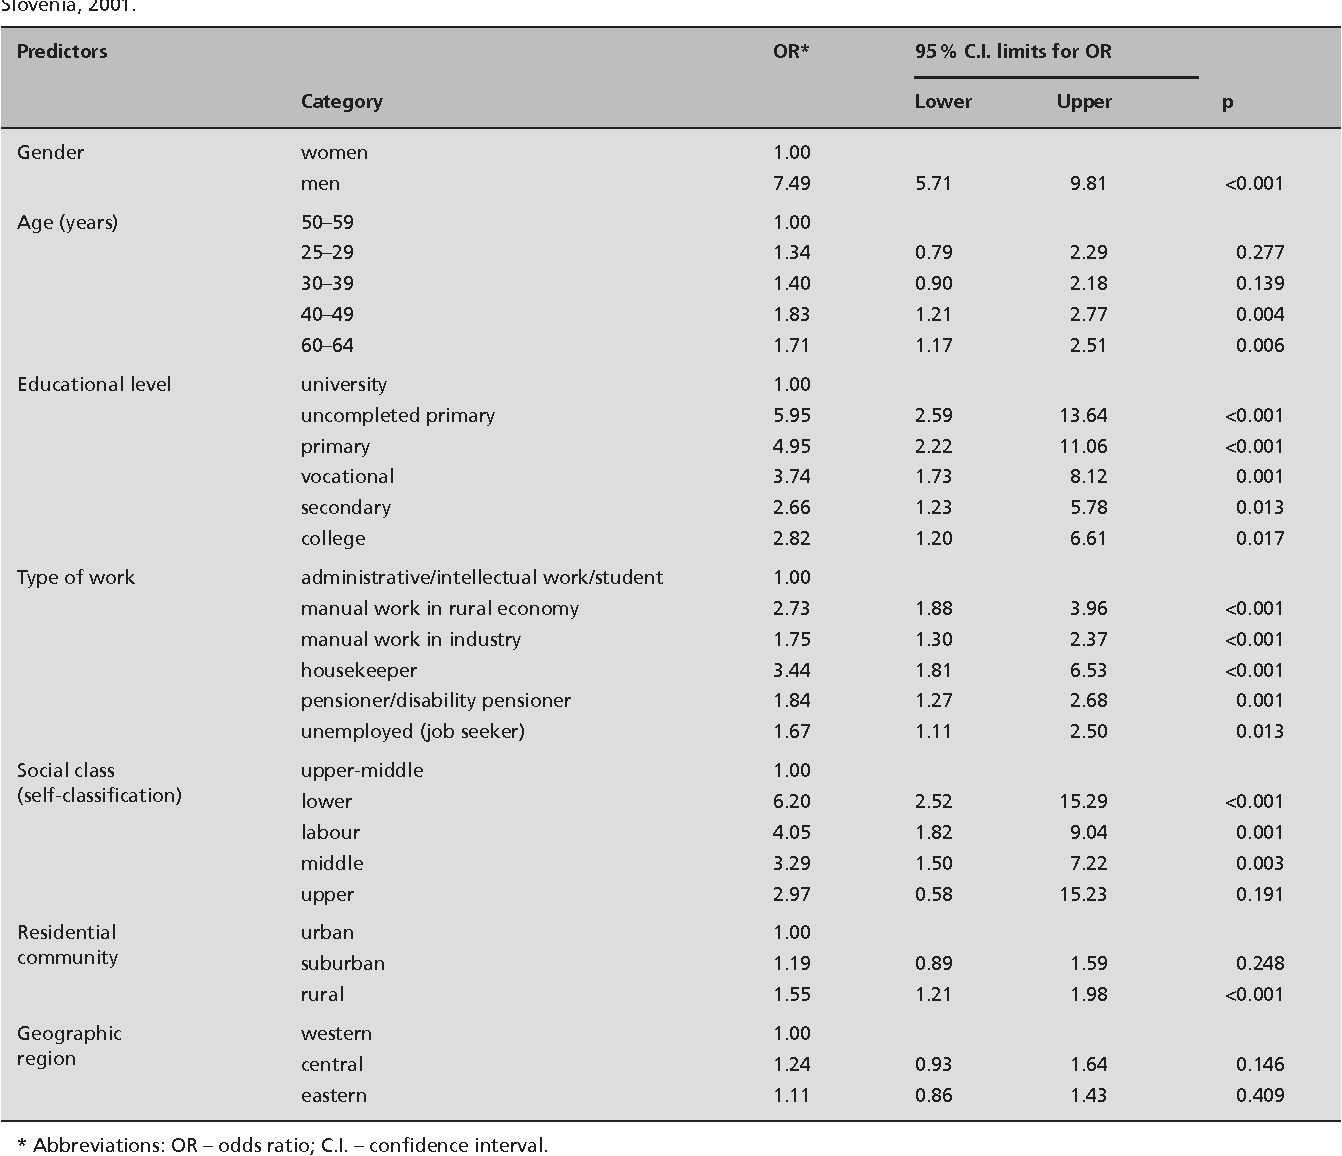 Table 5. Multivariate associations between socio-economic predictors of poor oral self-care in 7,539 participants of the health behaviour survey in Slovenia, 2001.